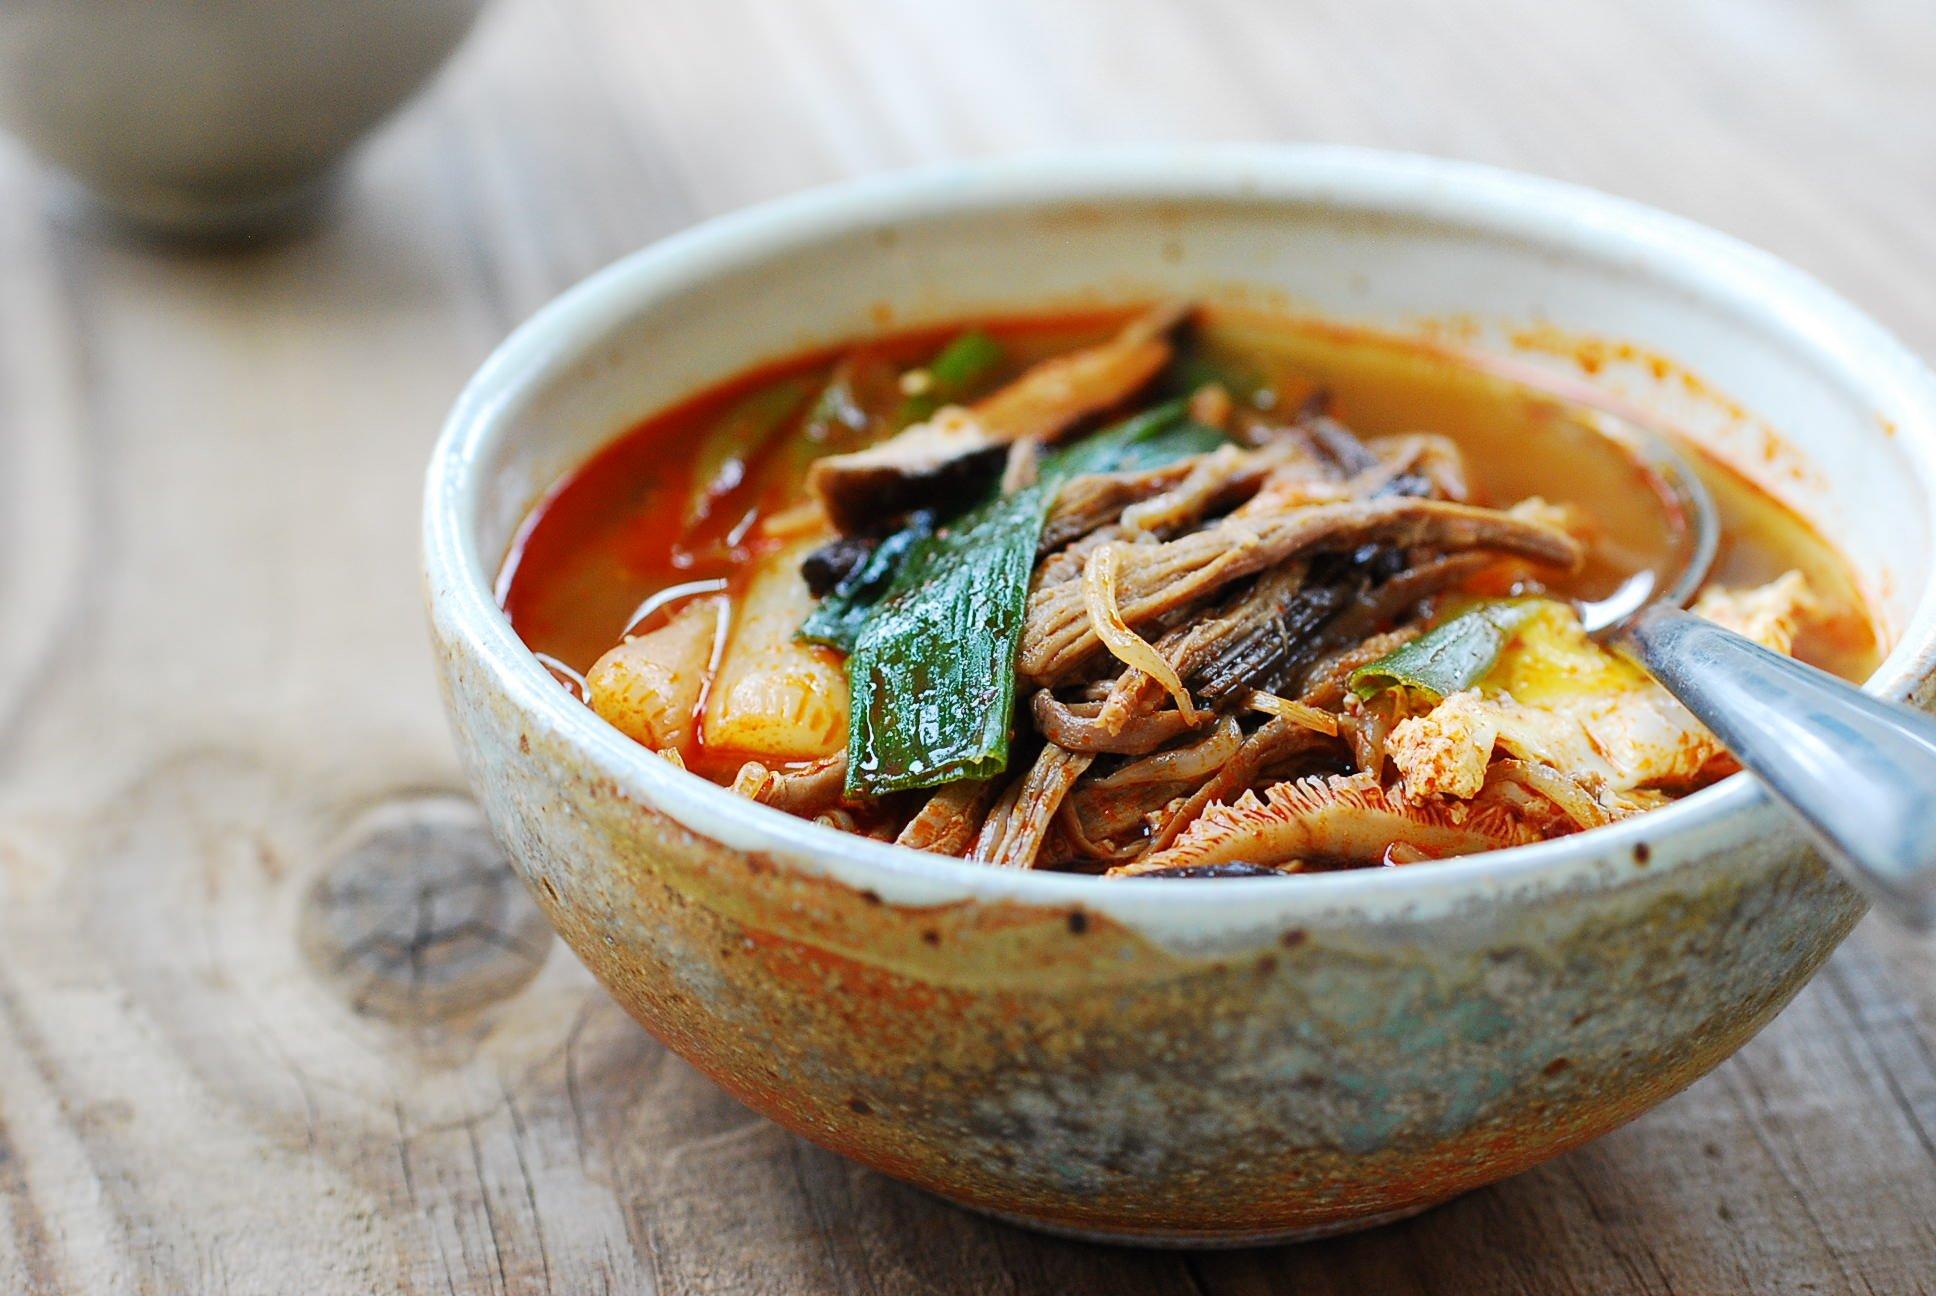 Yukgaejang Spicy Beef Soup With Vegetables Korean Bapsang